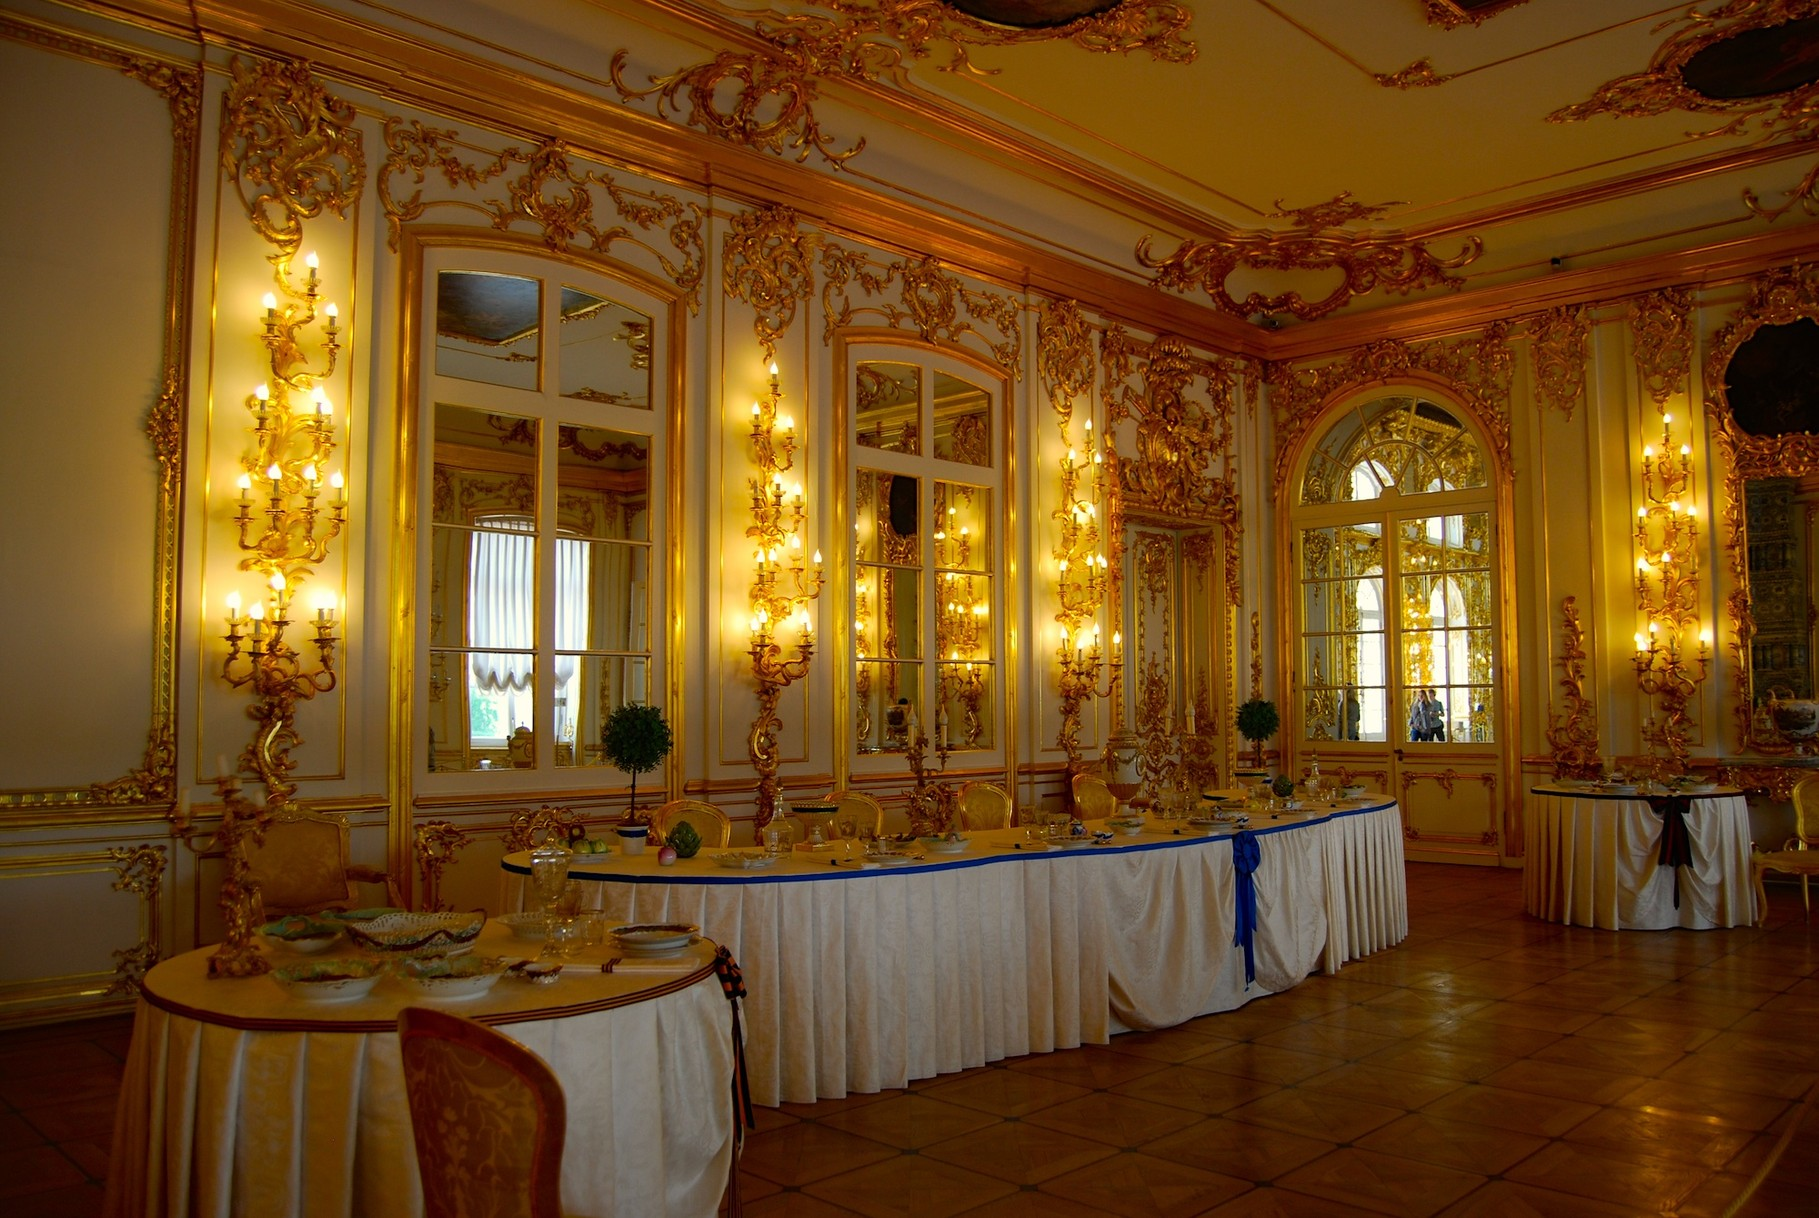 Zimmer im Ekaterinenpalast in Pushkin